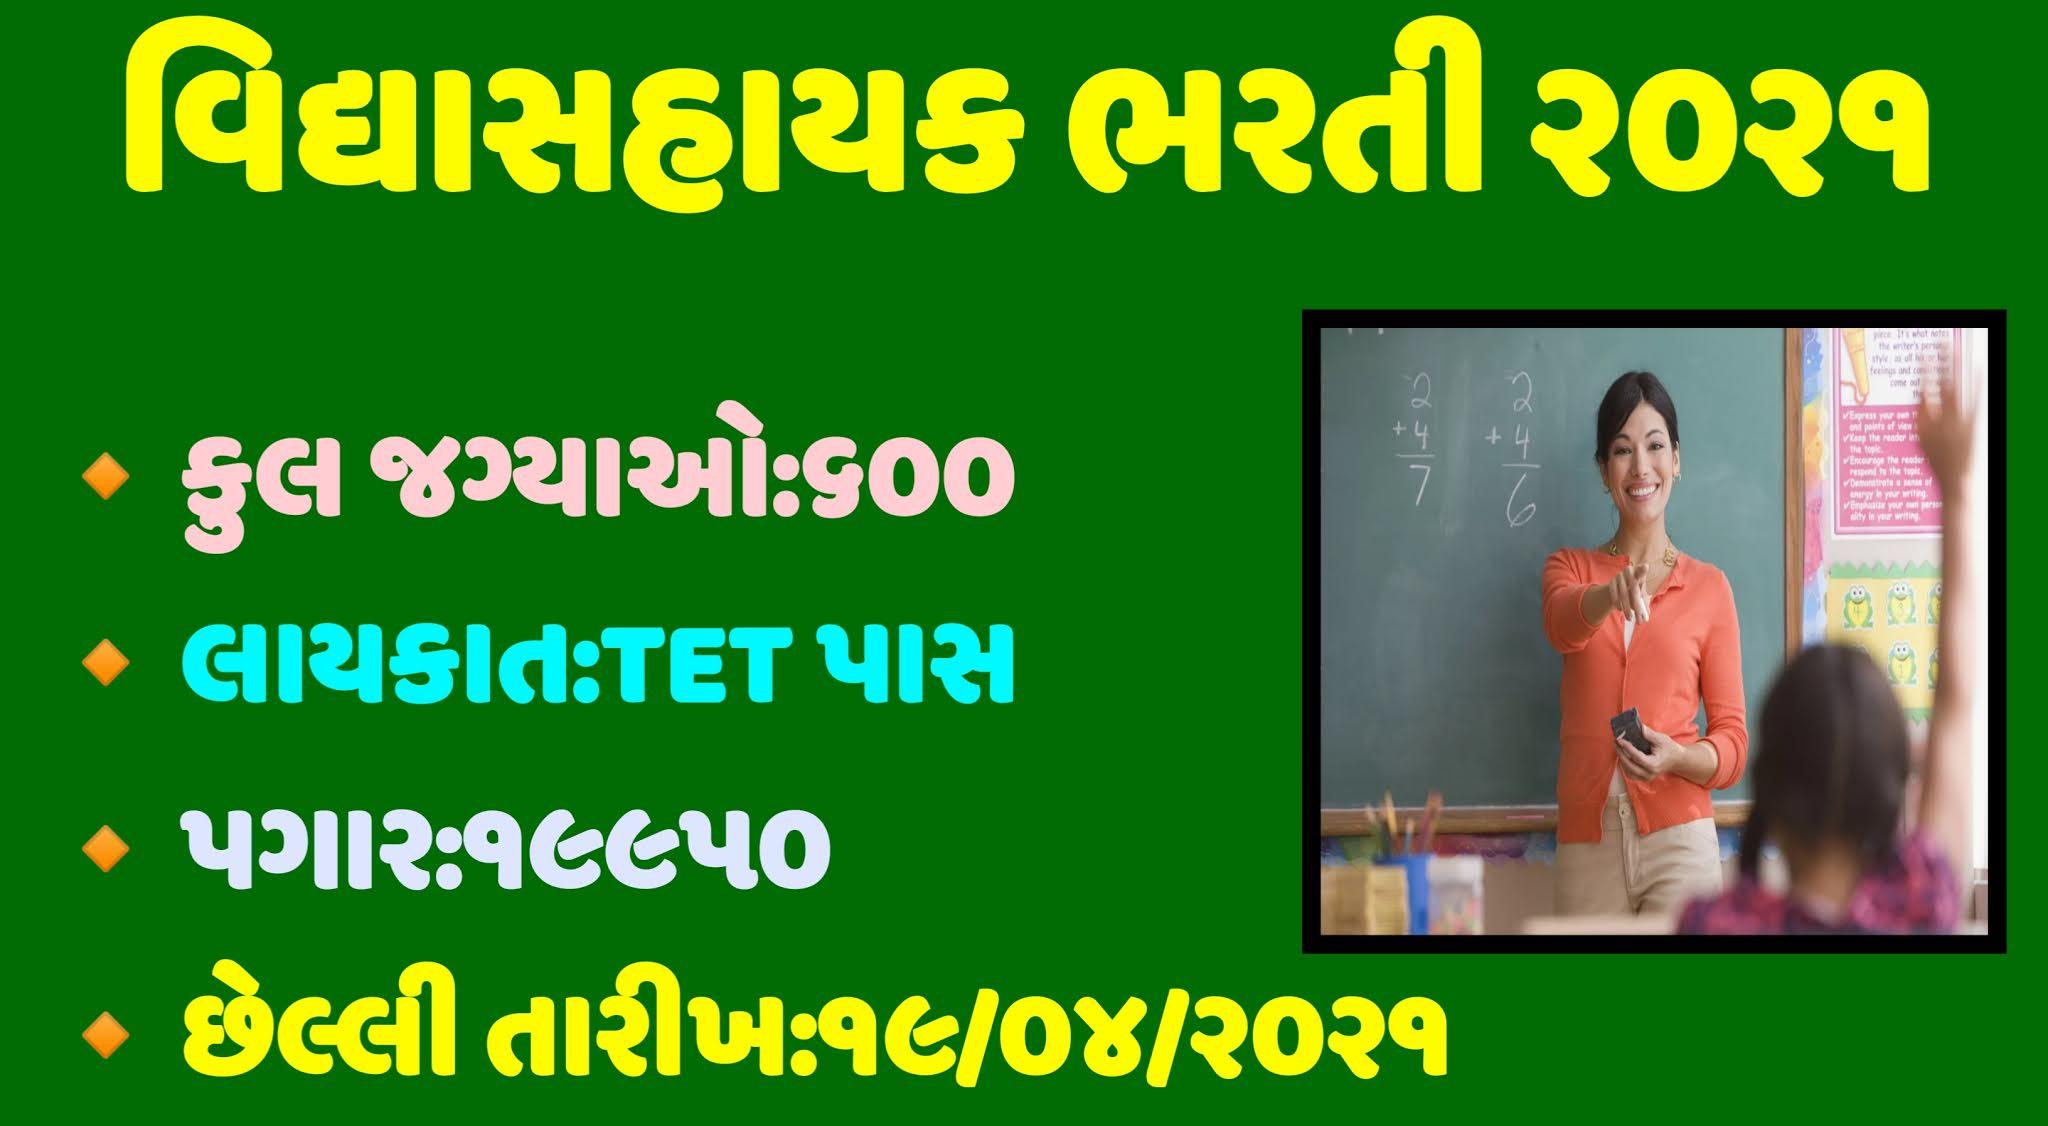 Gujarat vidhyasahayak bharti 2021, vidhyasahayak bharti 2021, gujarat vidhyasahayak bharti 2021 other medium, gujarat vidhyasahayak recruitment 2021,vidhyasahayak bharti 2021 merit list,gujarat vidhyasahayak bharti apply online